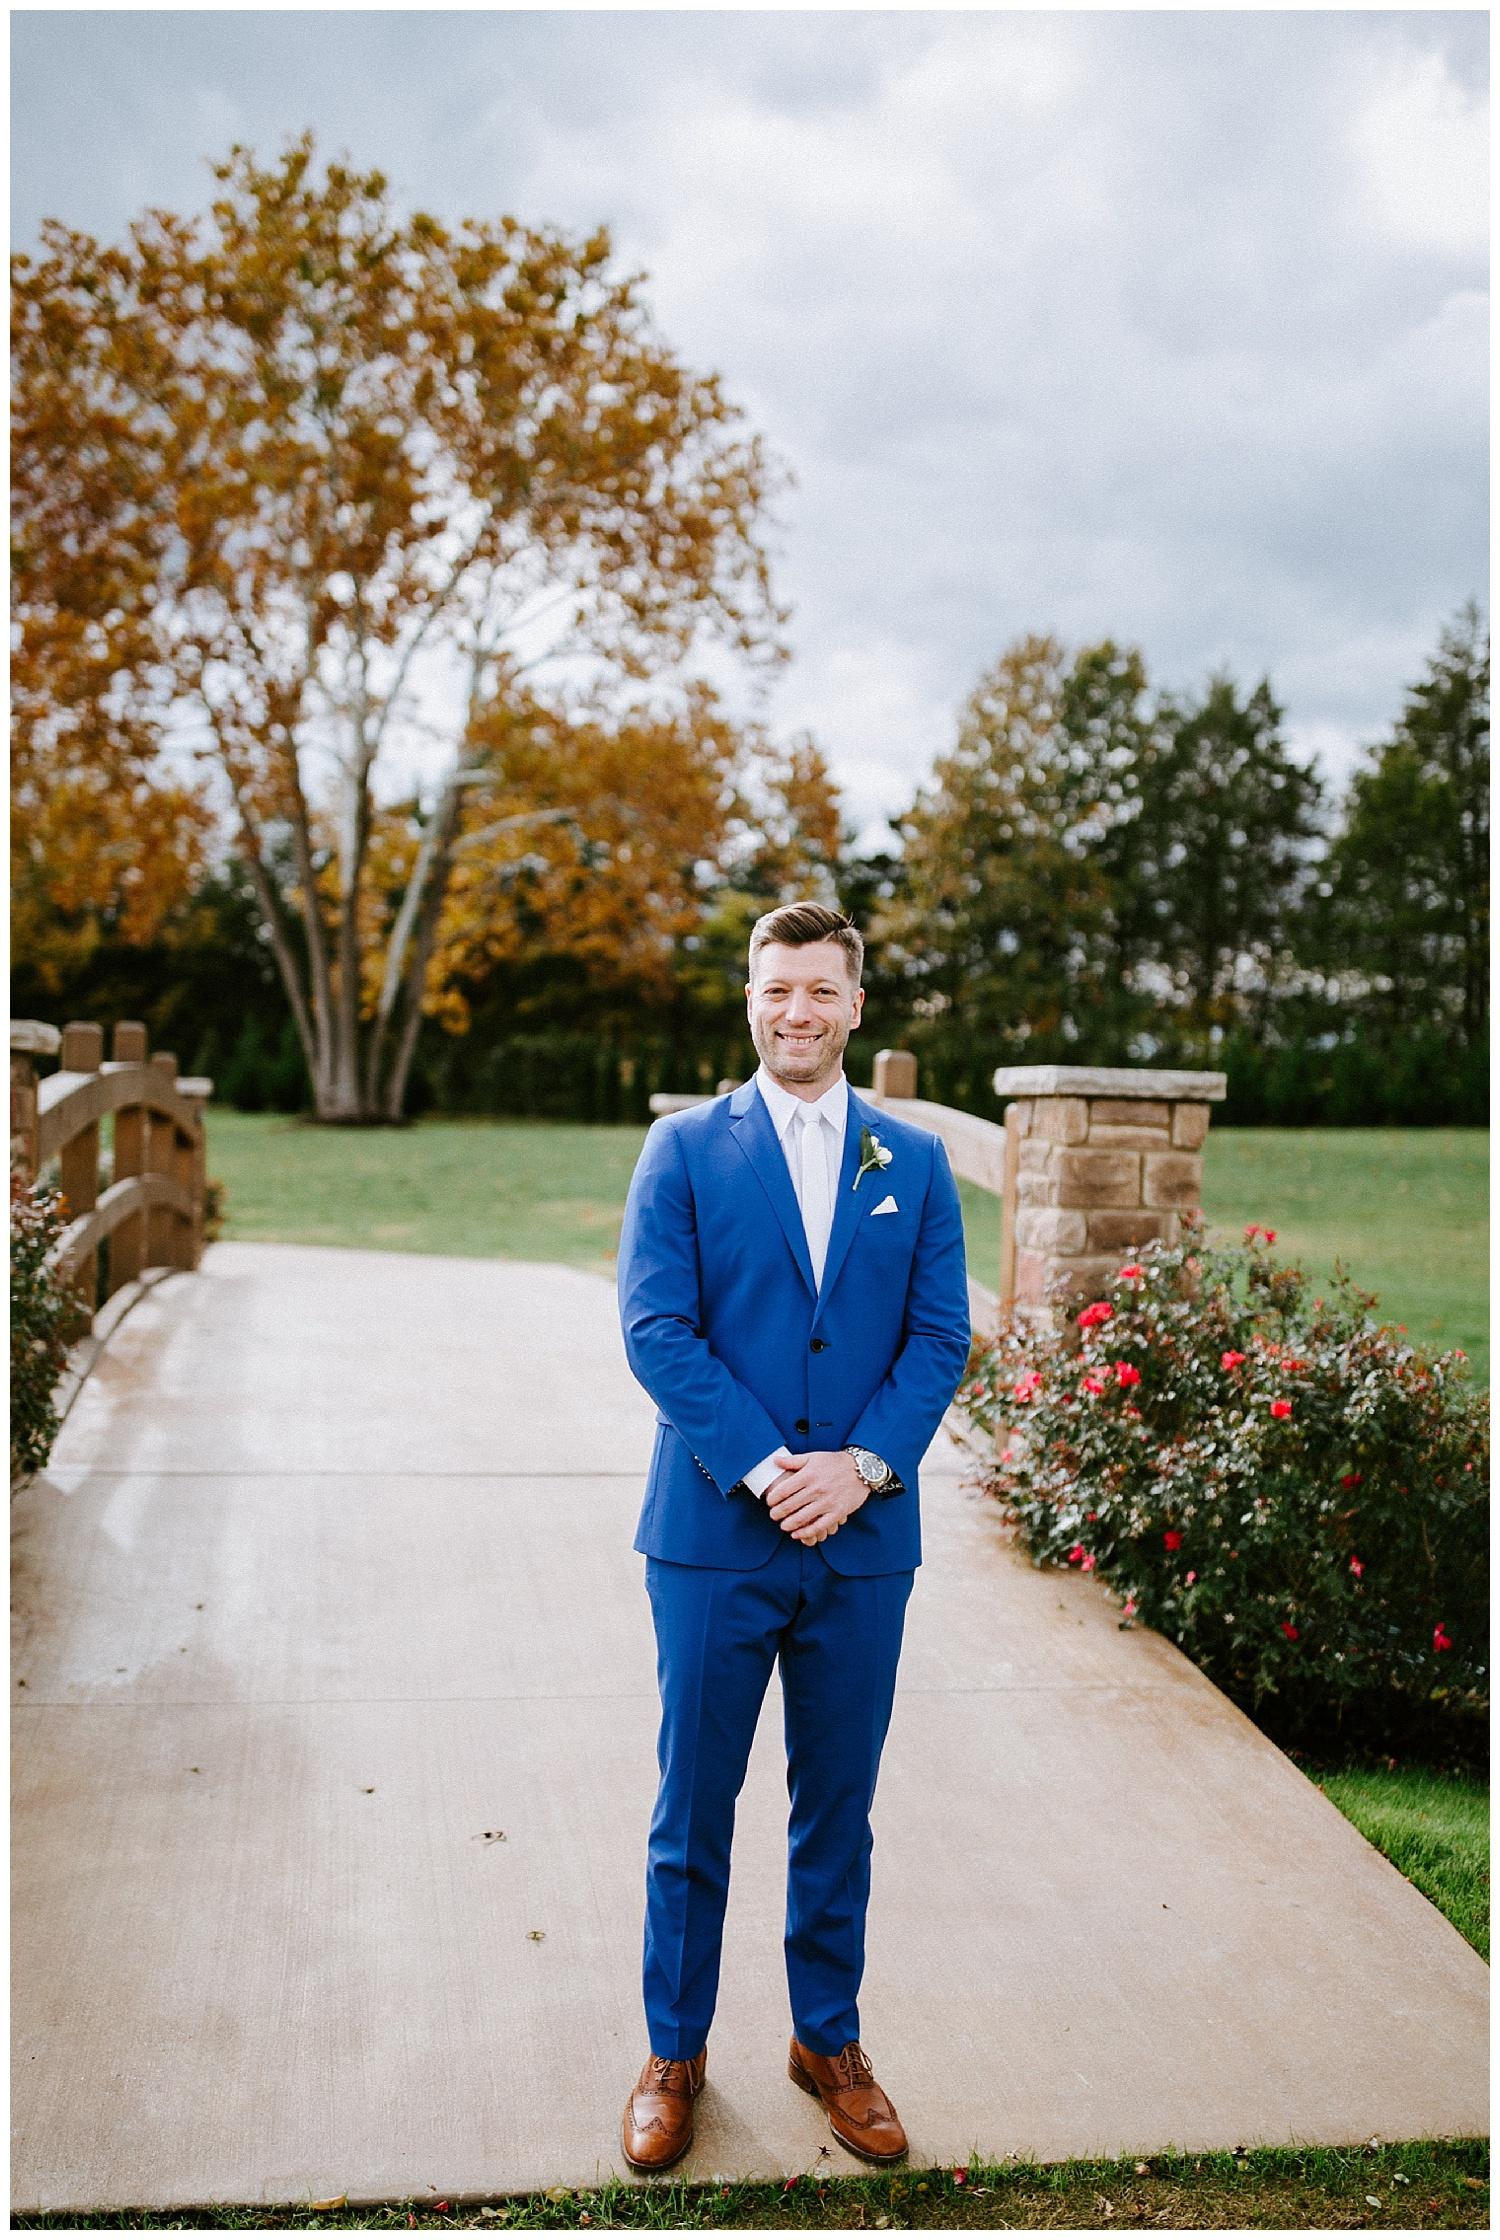 classy-wedding-sycamore_farms-nashville-tn2019-01-22_0015.jpg